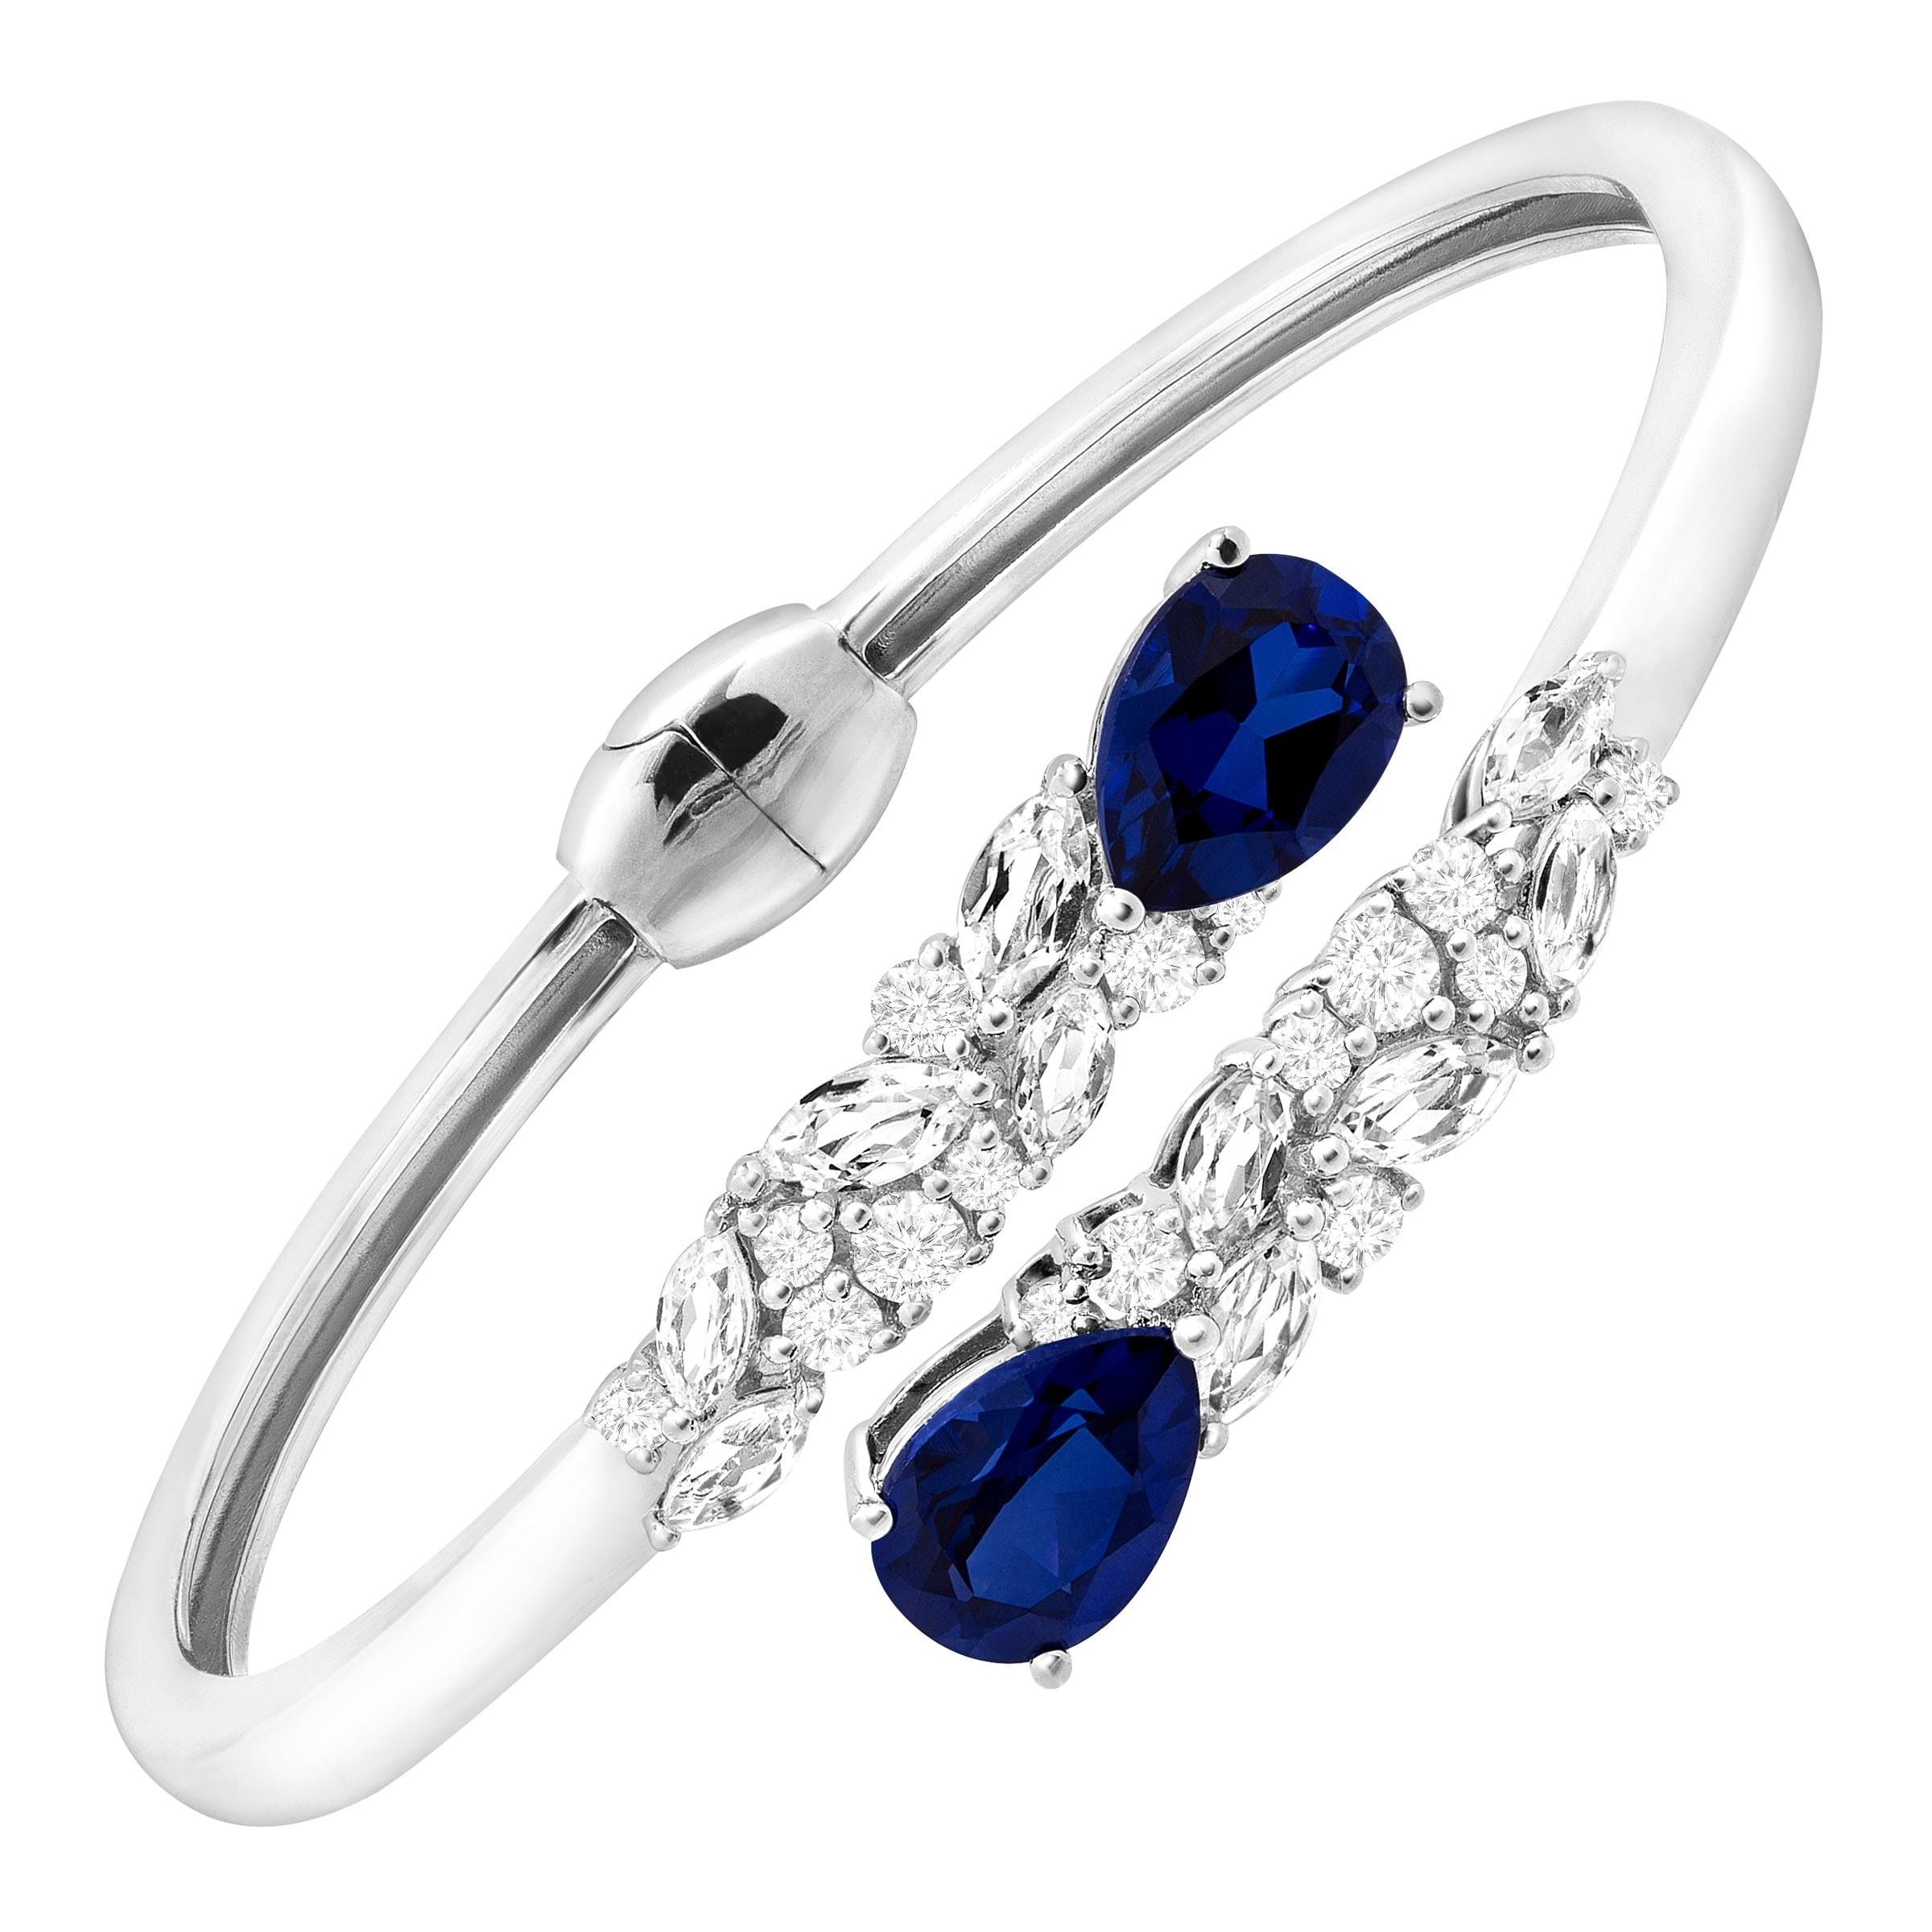 a815aa35ec4 Buy Sapphire Gemstone Bracelets Online at Overstock